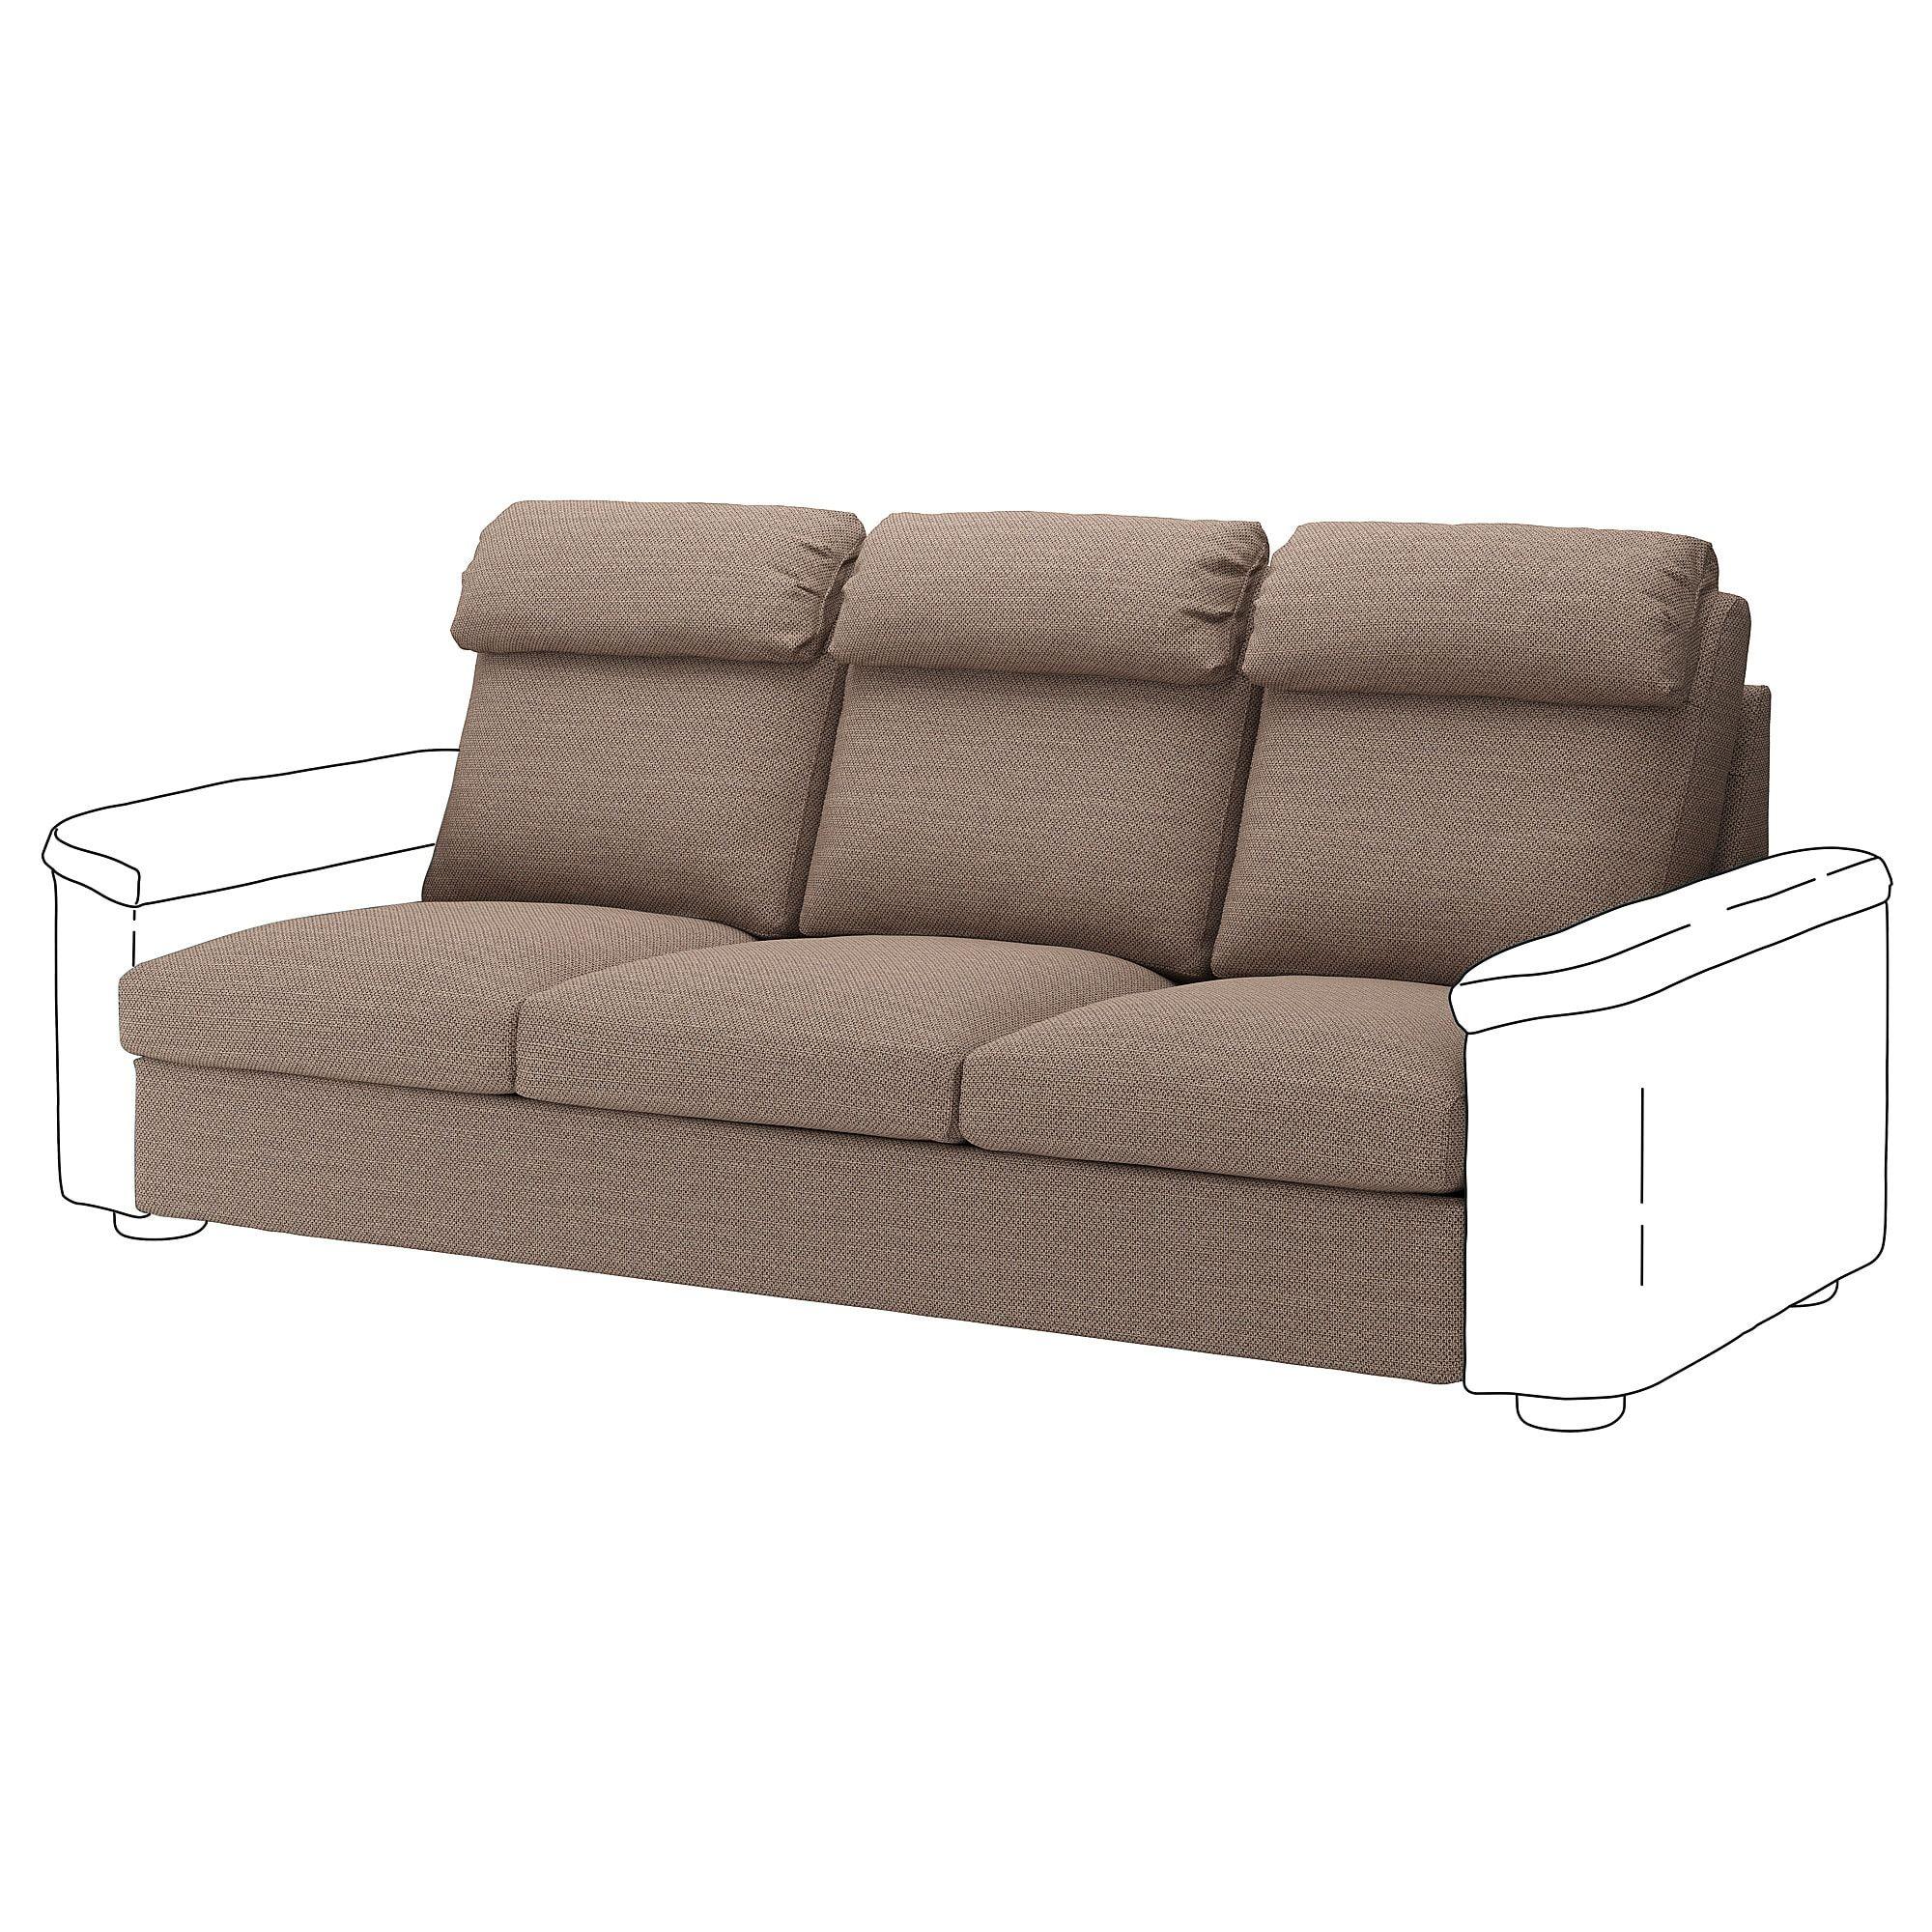 Lidhult Sofa Section Lejde Beige Brown Modular Sofa Ikea Sofa